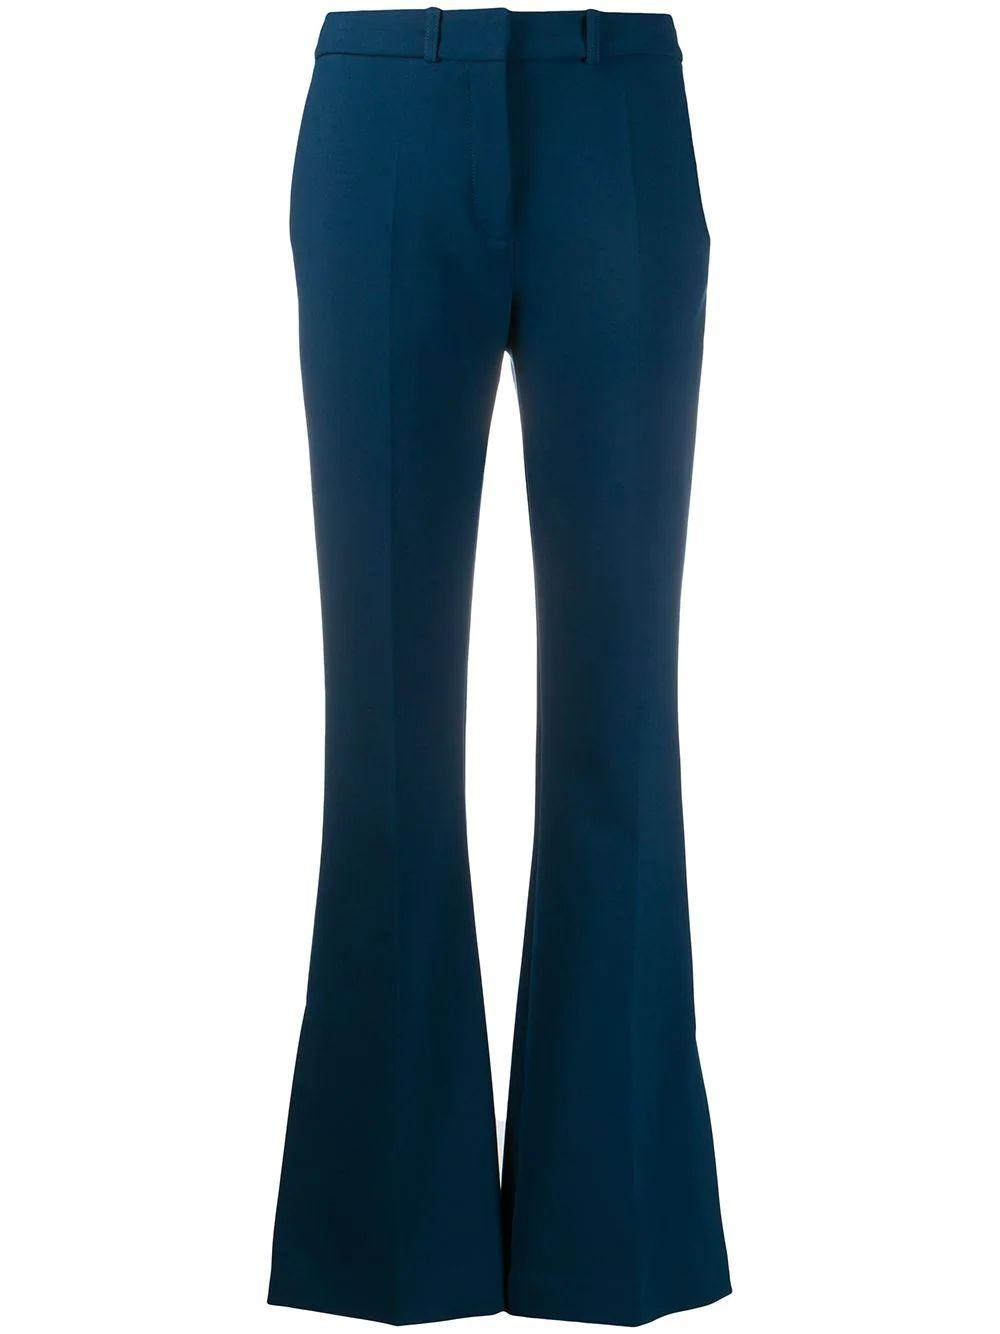 Split Hem Victoria Trouser Item # 2120WTR000431A